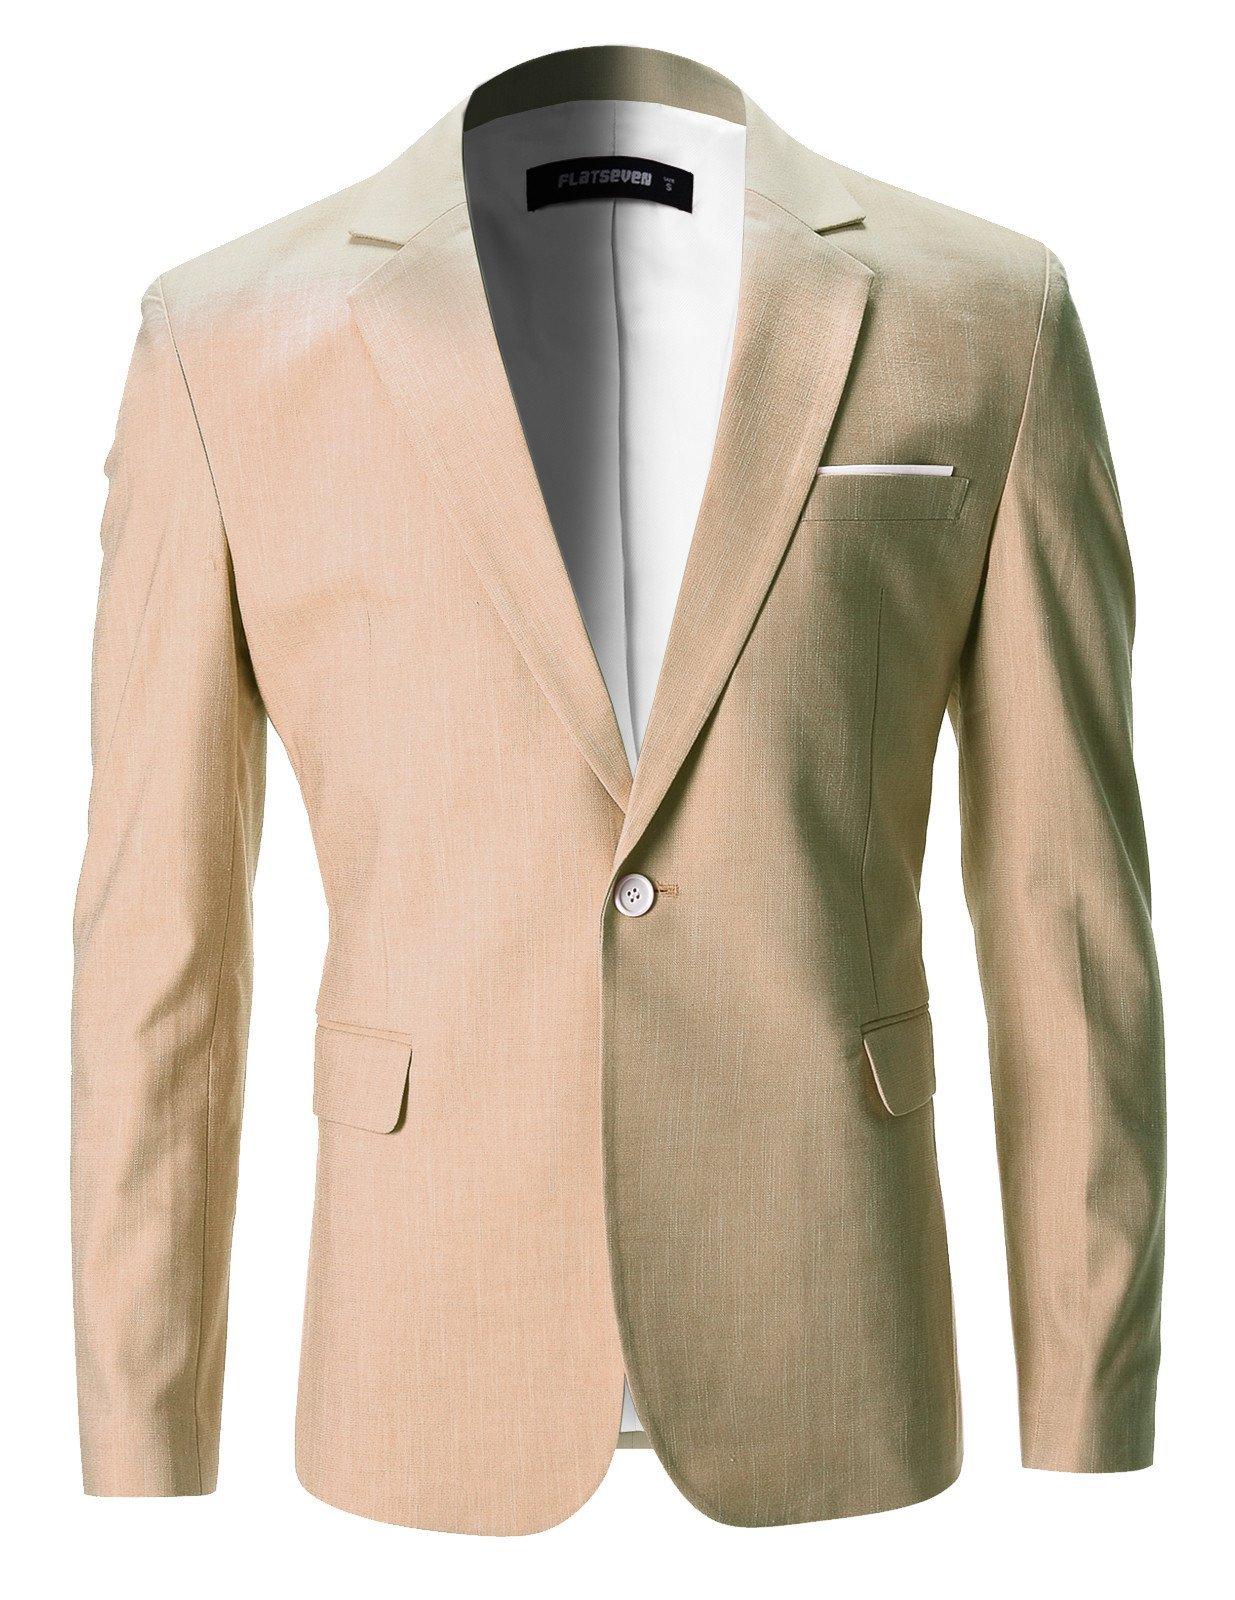 FLATSEVEN Mens Slim Fit Cotton Stylish Casual Blazer Jacket (BJ202) Beige, S